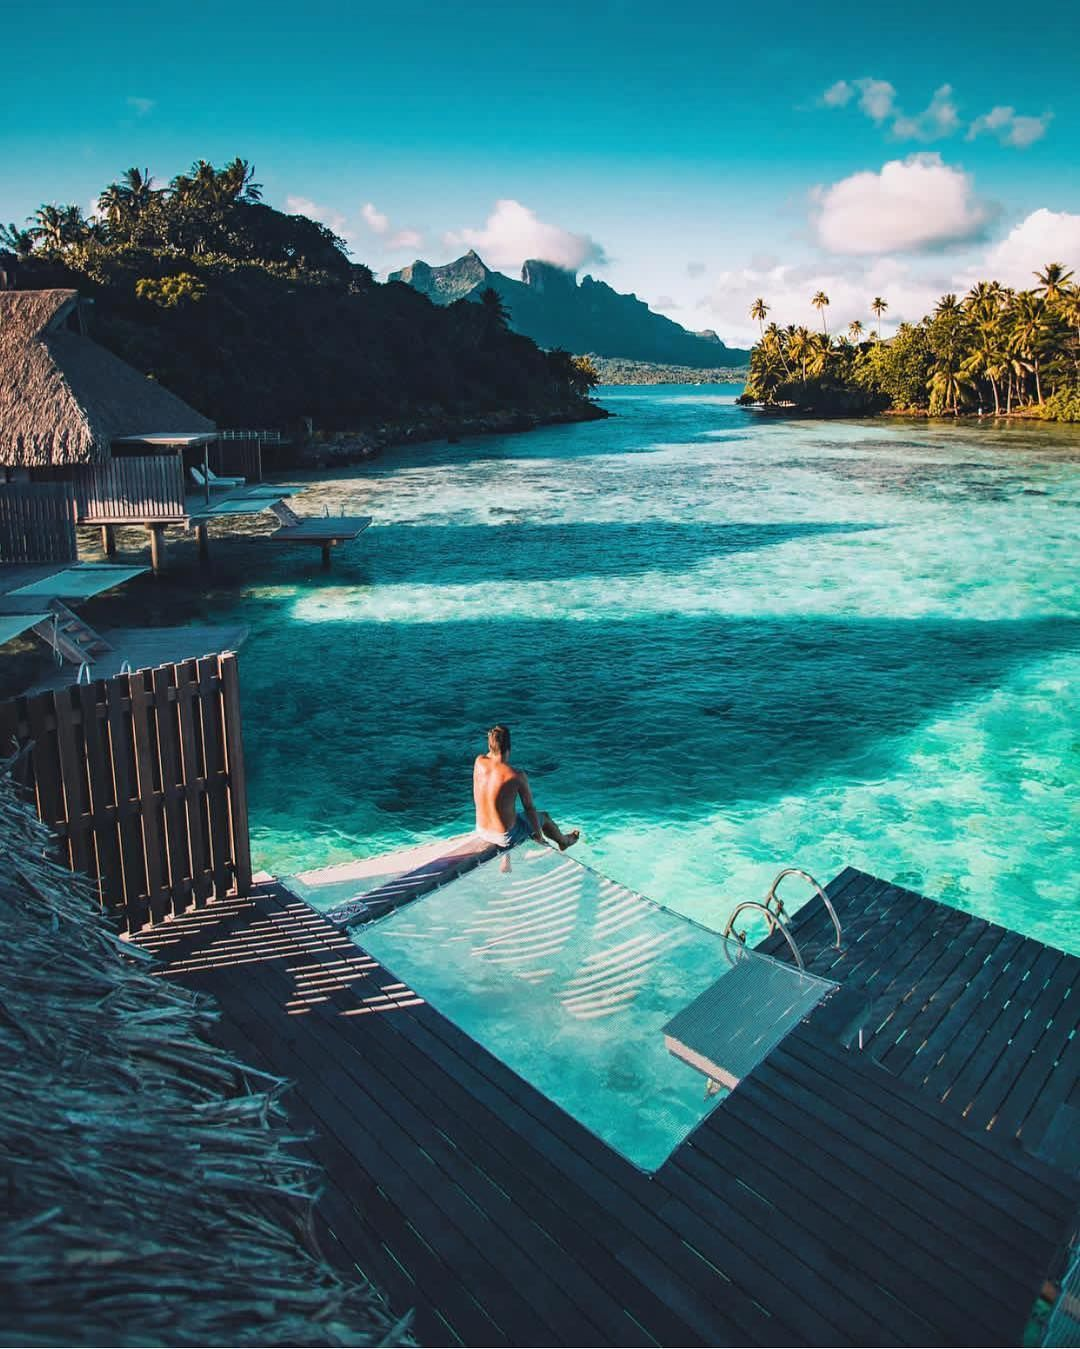 Beaches N Resorts On Instagram Bora Bora Is Always A Good Idea Credits Erubes1 Beachesnresor Luxury Travel Best Honeymoon Destinations Bora Bora